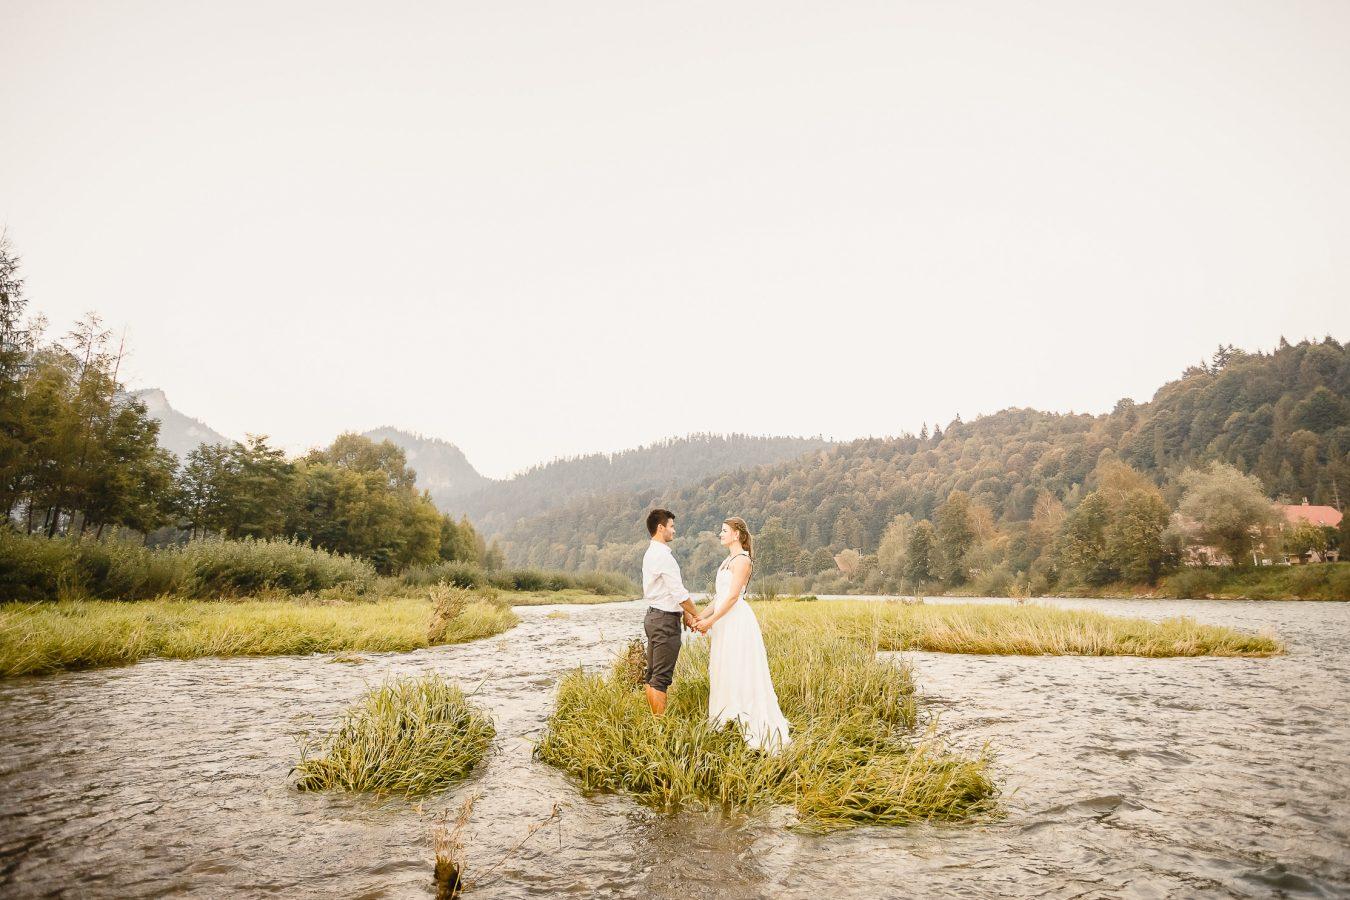 Destination wedding portrait of bride and groom in Pieniny